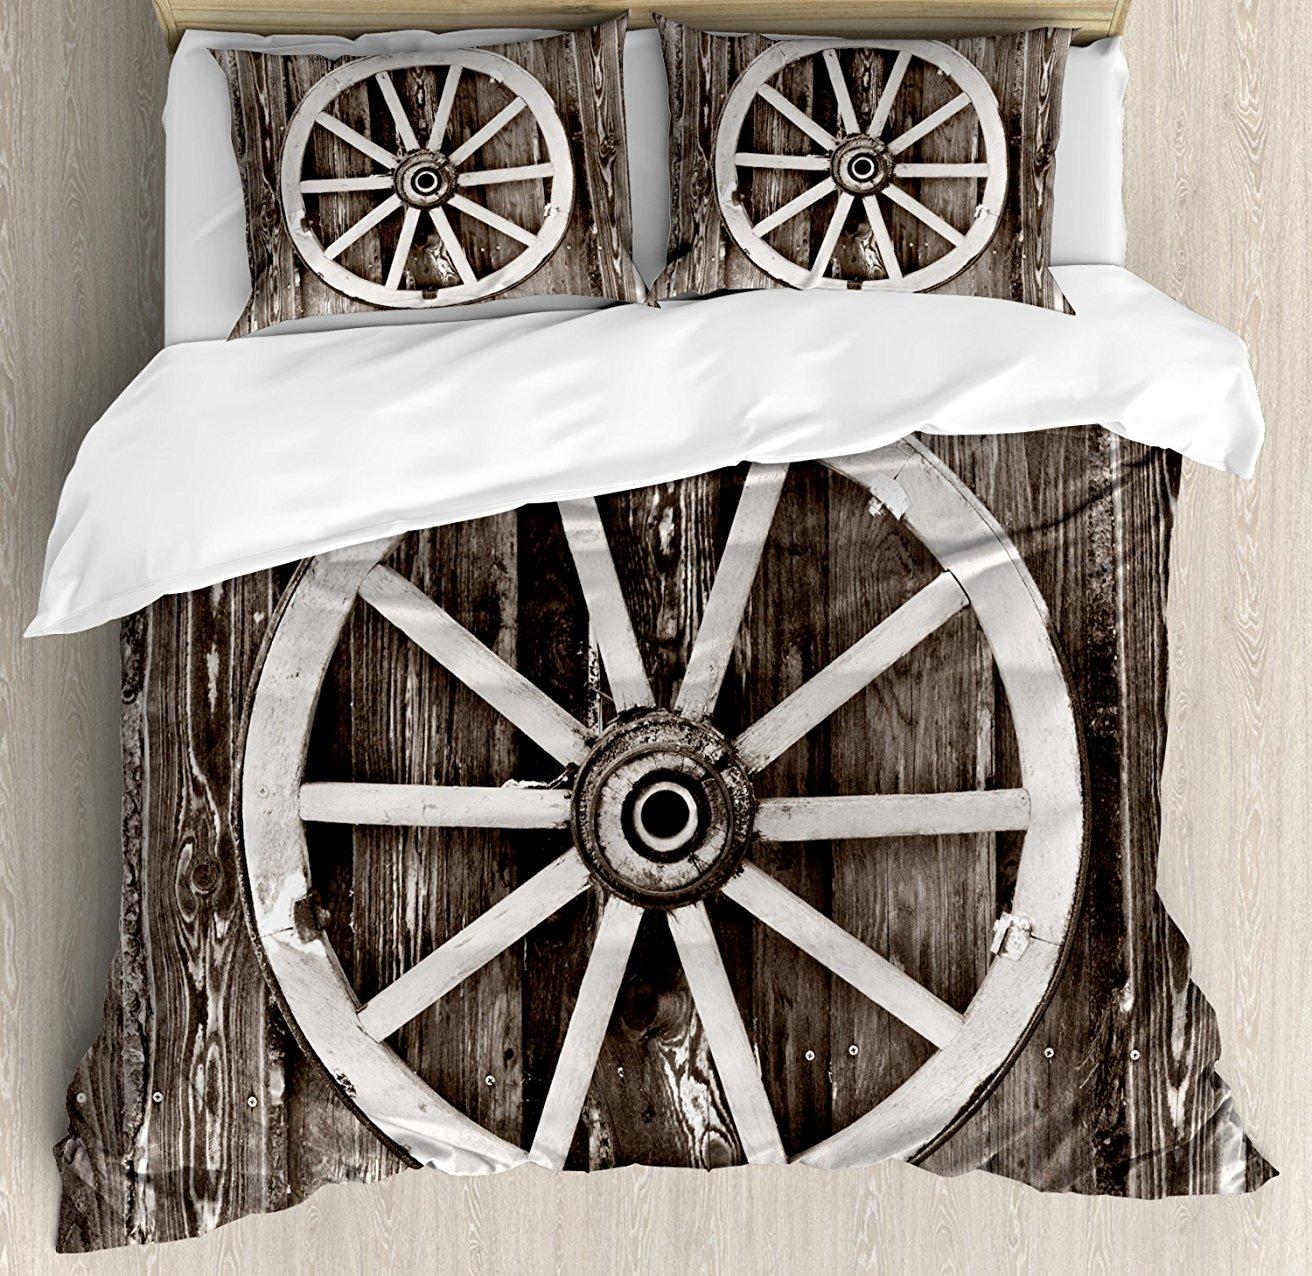 Us 10779 30 Offbarn Wood Wagon Wheel Duvet Cover Set Retro Wheel On Timber Wall Barn House Village Cart Circle 4 Piece Bedding Set In Bedding